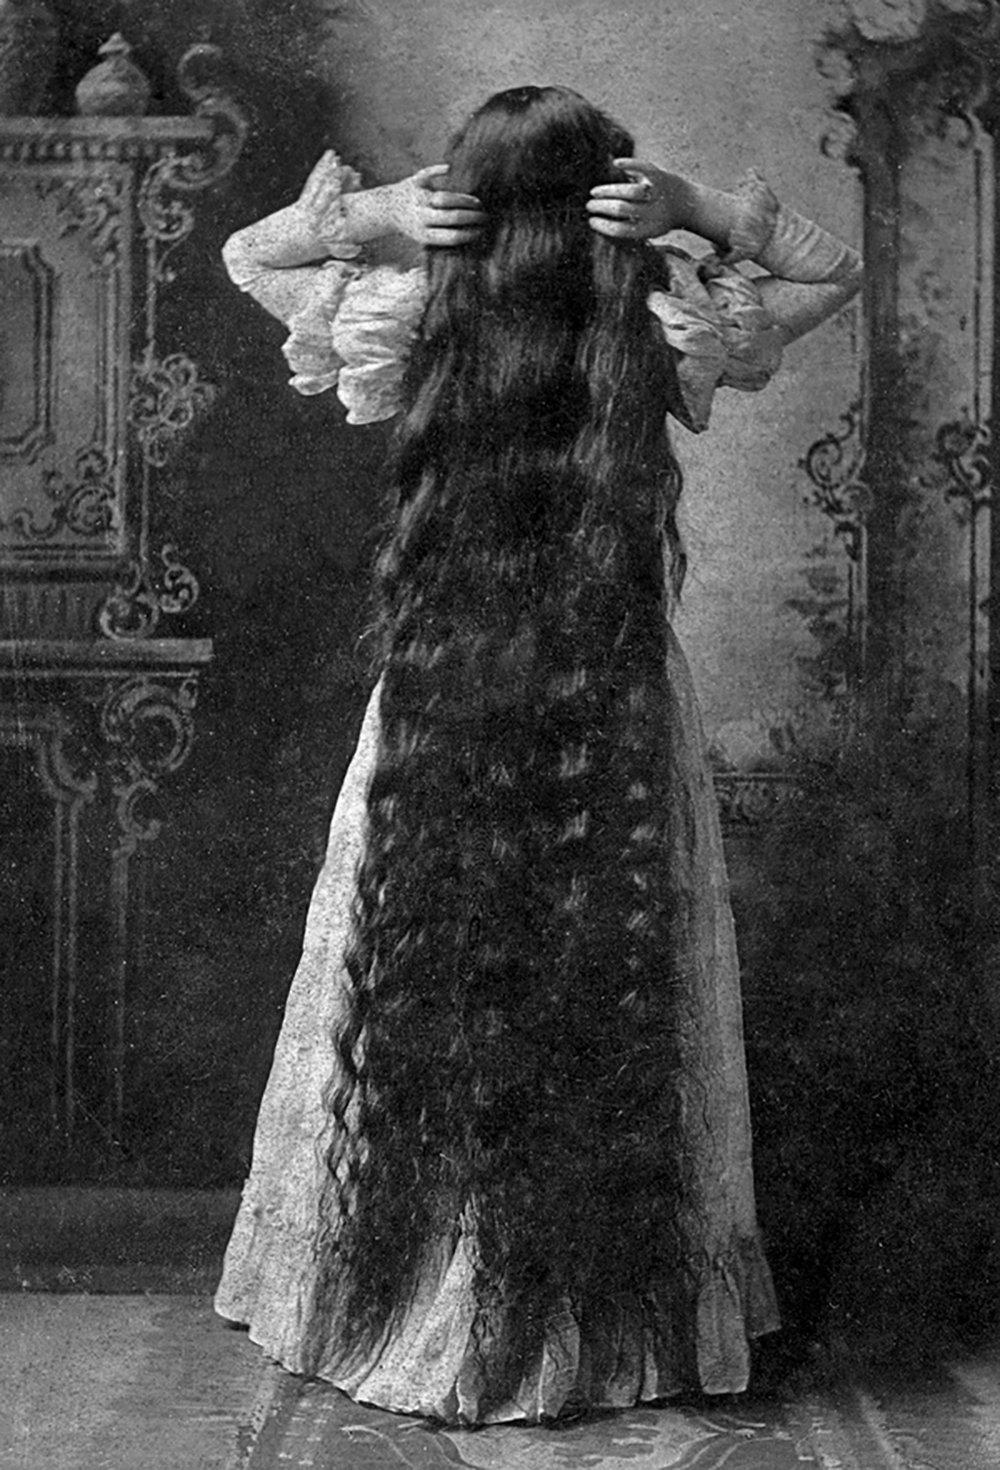 Israël peuple barbu aux cheveux longs 200921023432248902